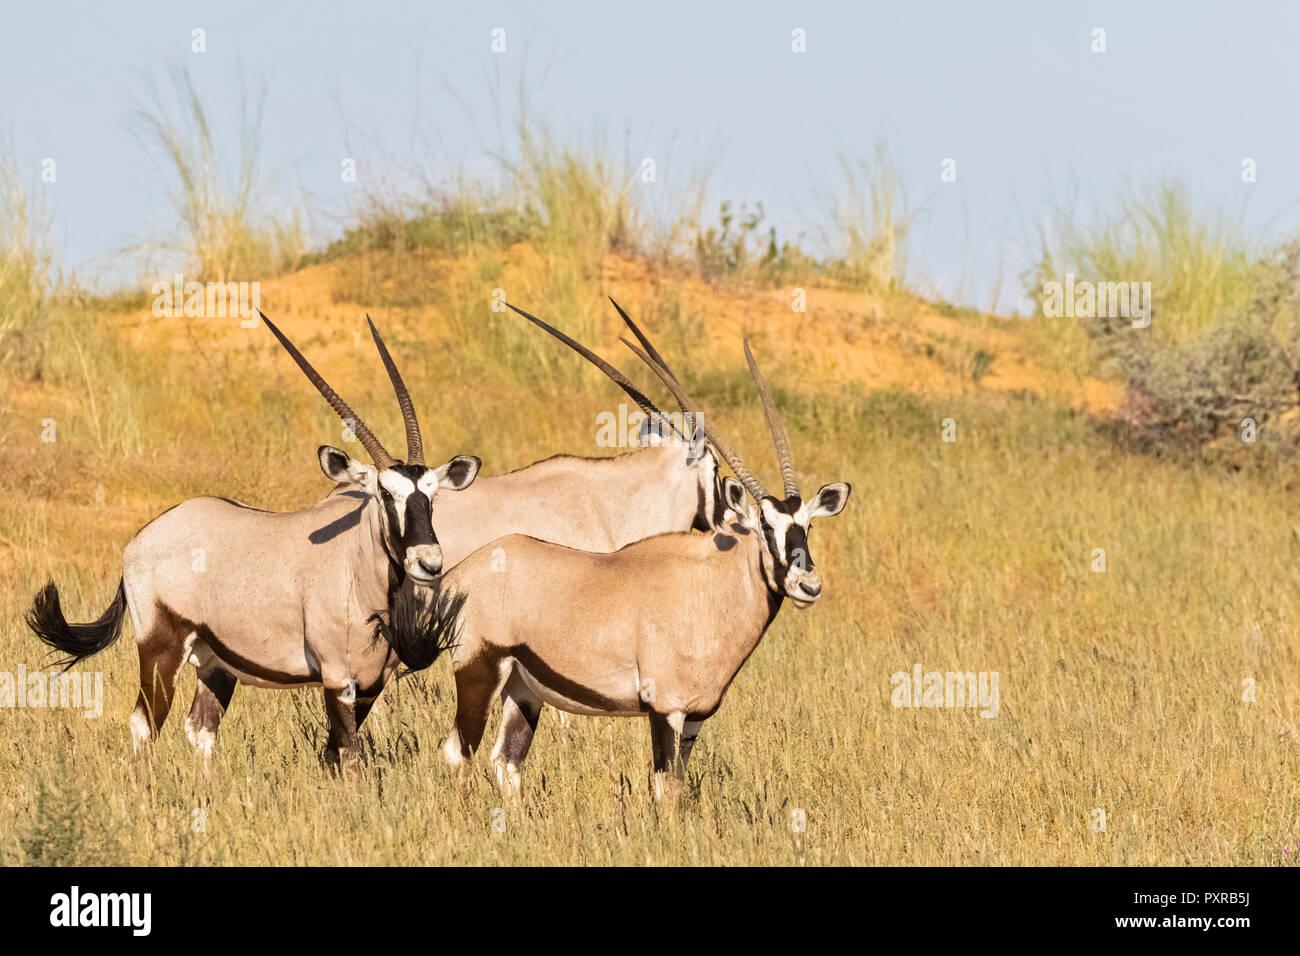 Botswana, Kalahari, Kgalagadi Transfrontier Park, Gemsboks, Oryx gazella - Stock Image